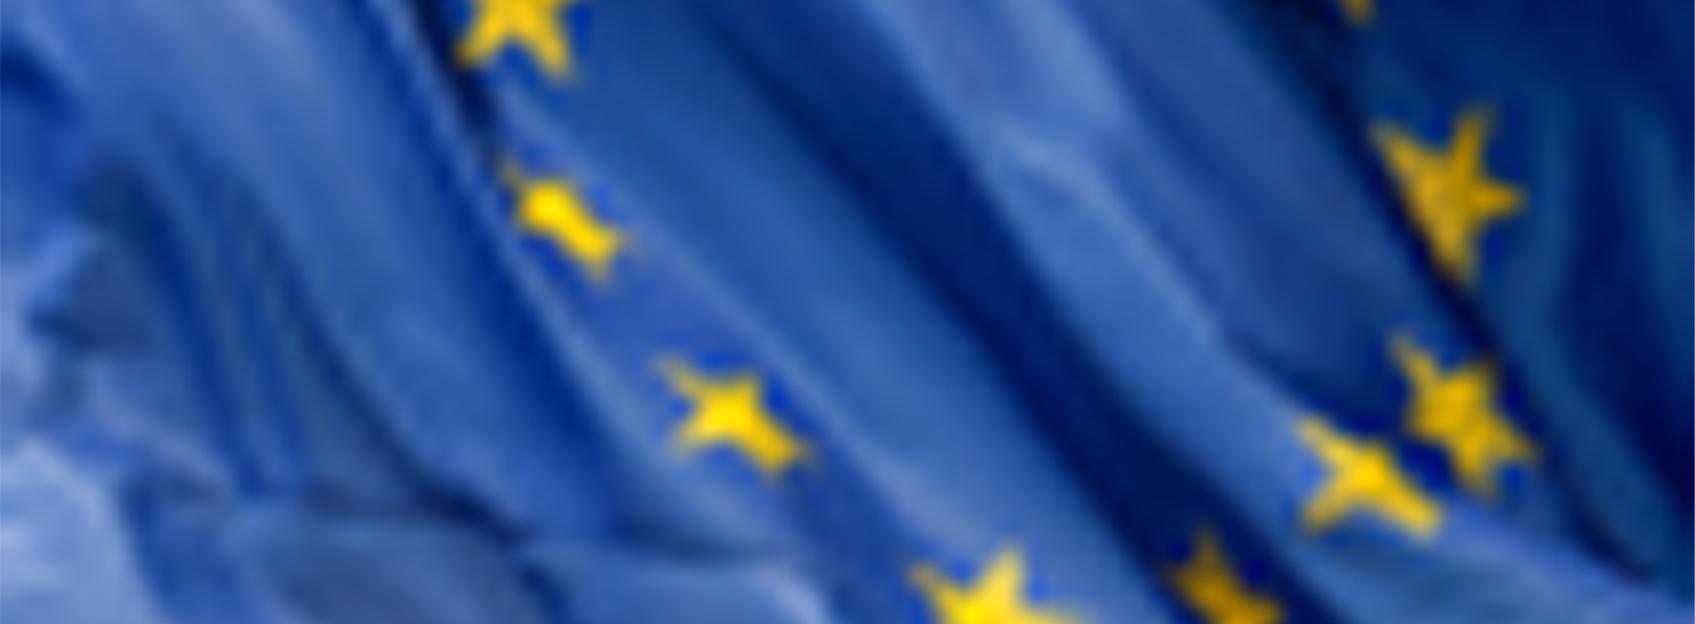 Europäer wünschen sich EU-Präsident aus Deutschland